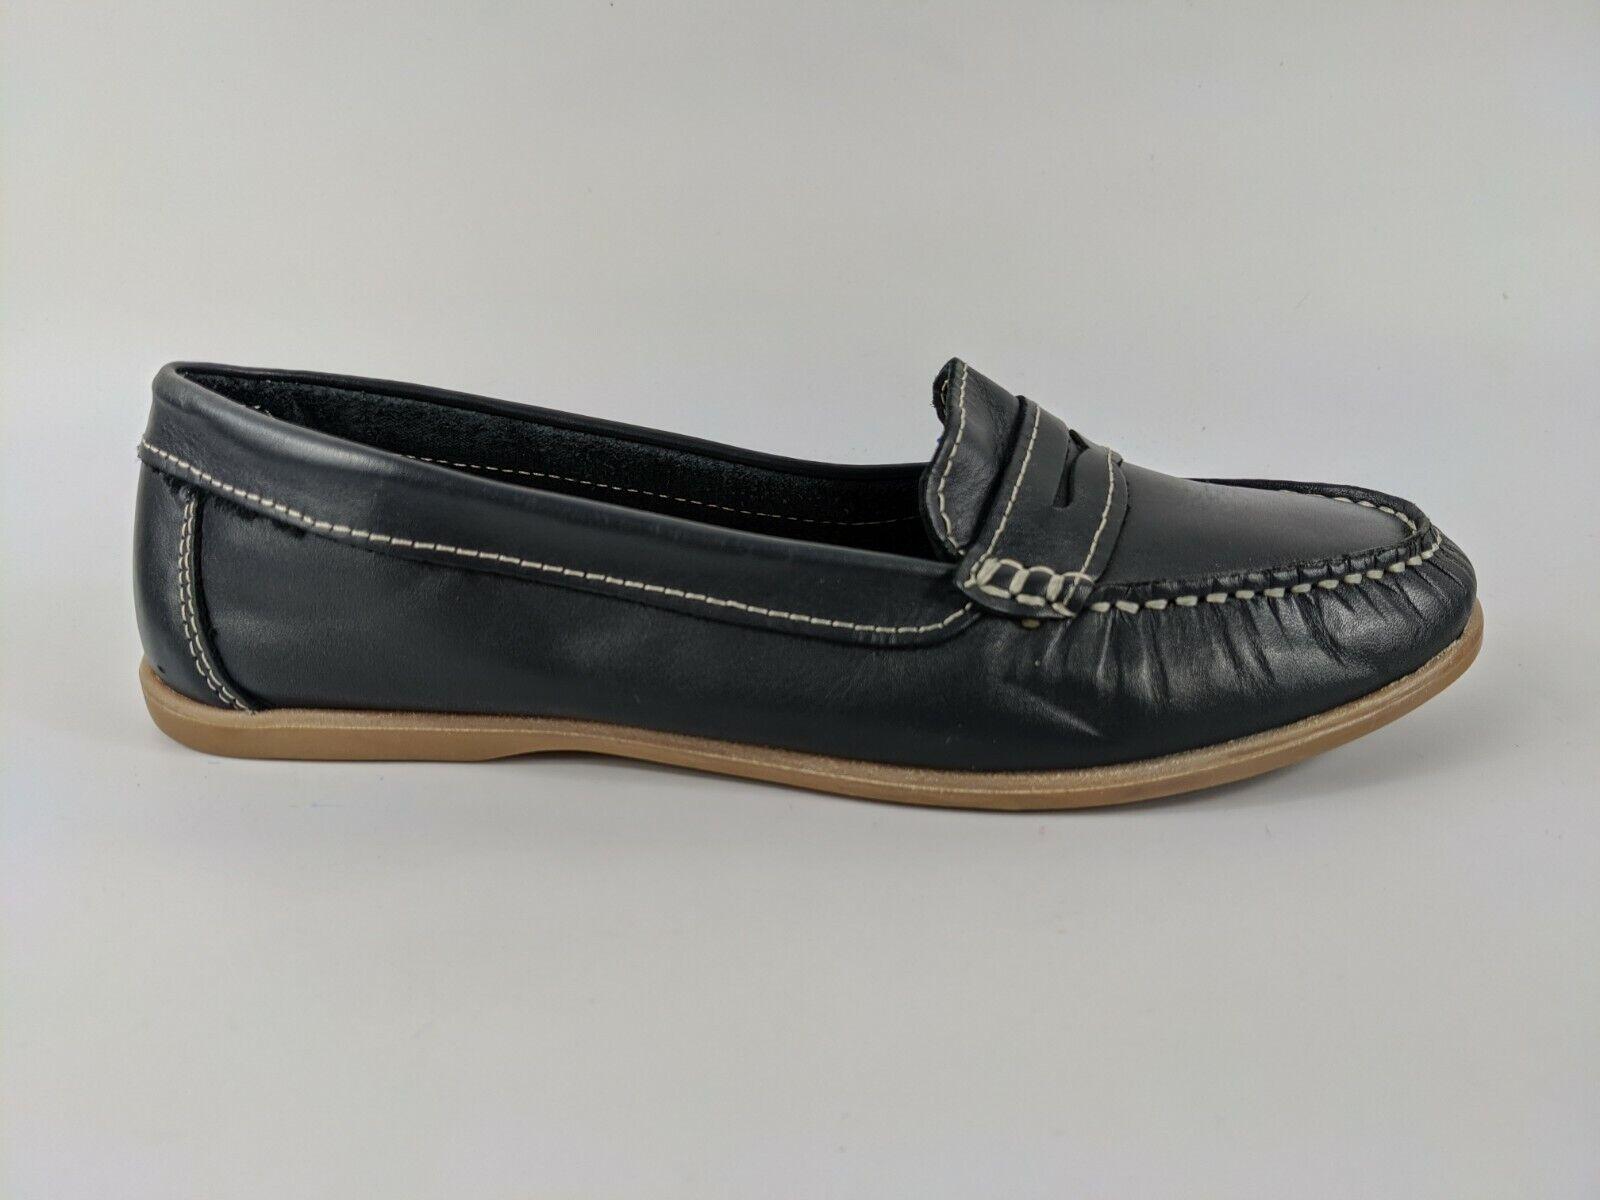 O.E Navy Leather Mocassin Slip On Shoes Uk 4 Eu 37 New